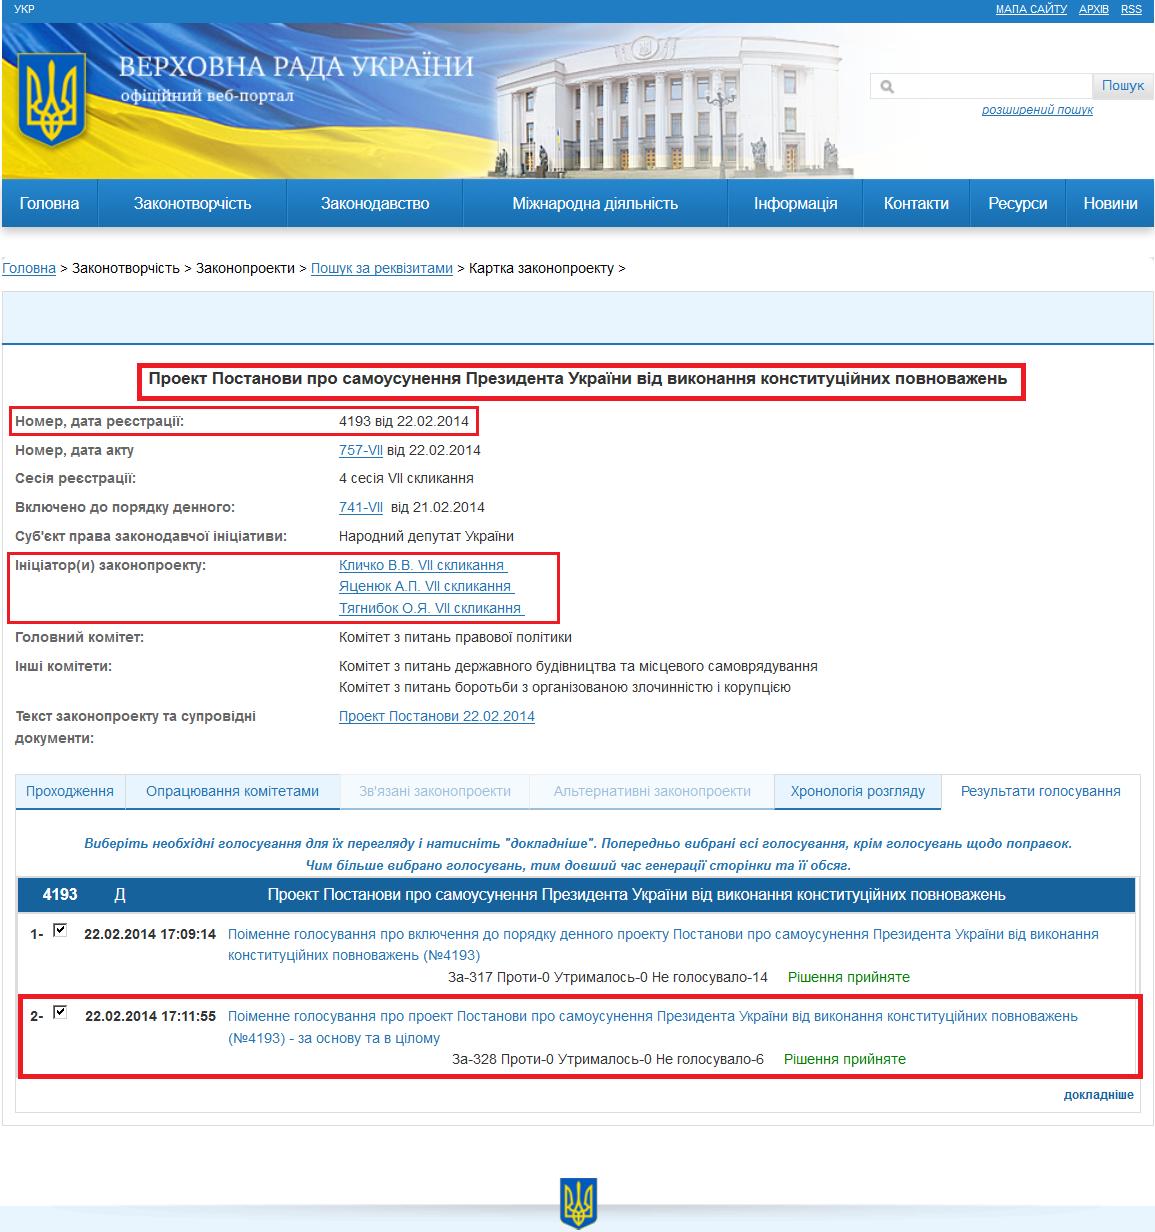 http://w1.c1.rada.gov.ua/pls/zweb2/webproc4_1?pf3511=49853